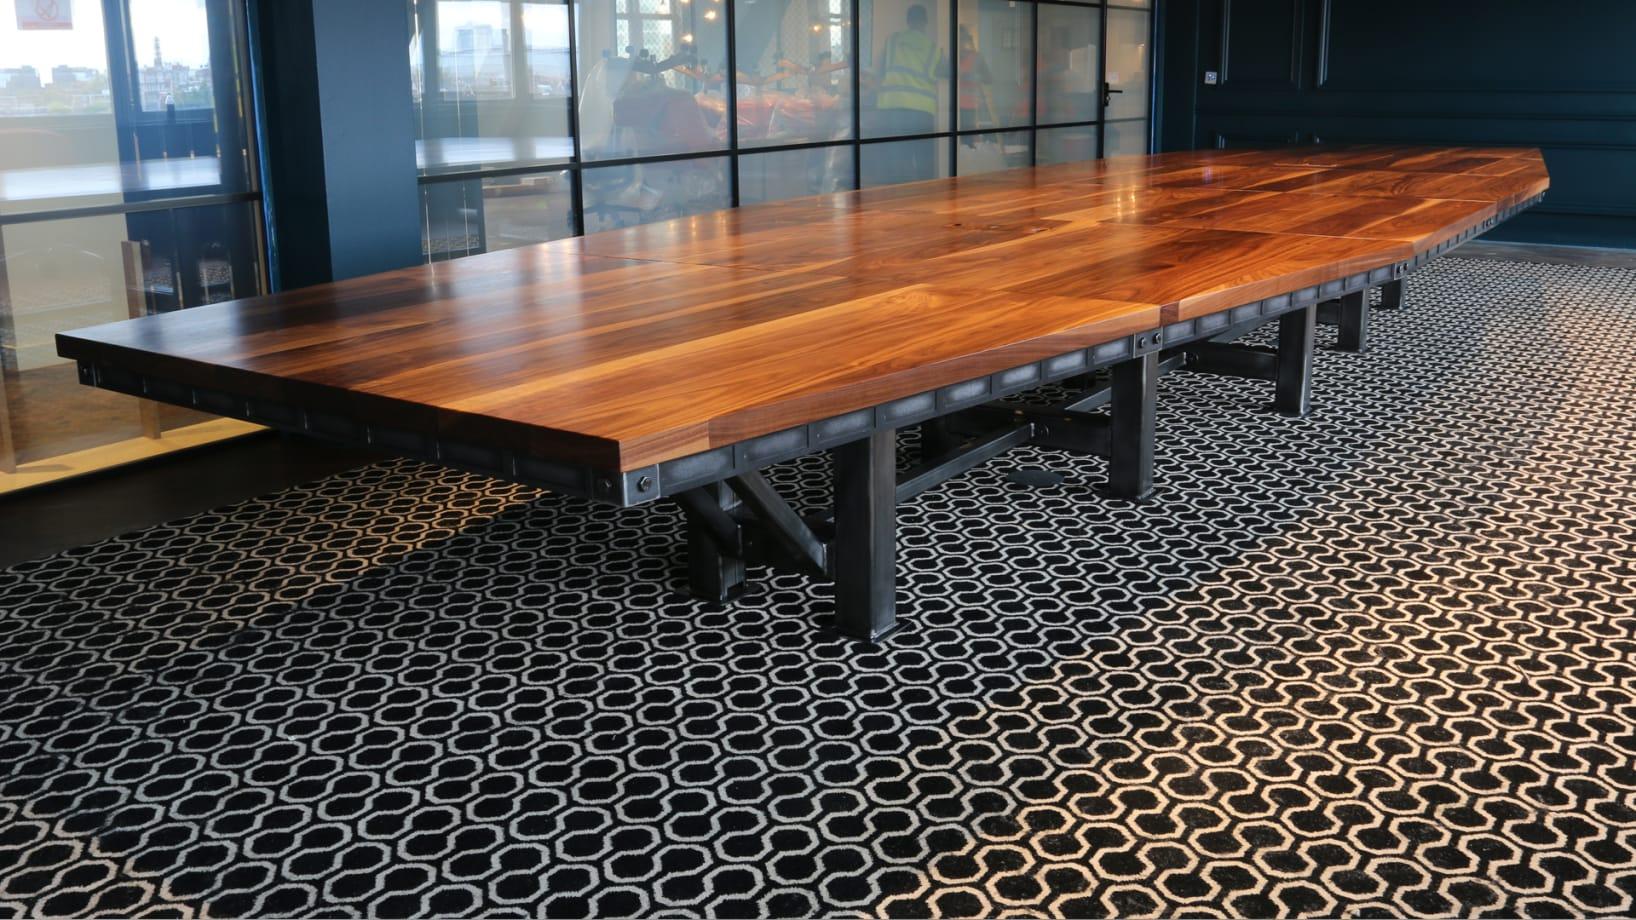 Steel Vintage   Case Study - Endemol Shine   Industrial Walnut Boardroom Table